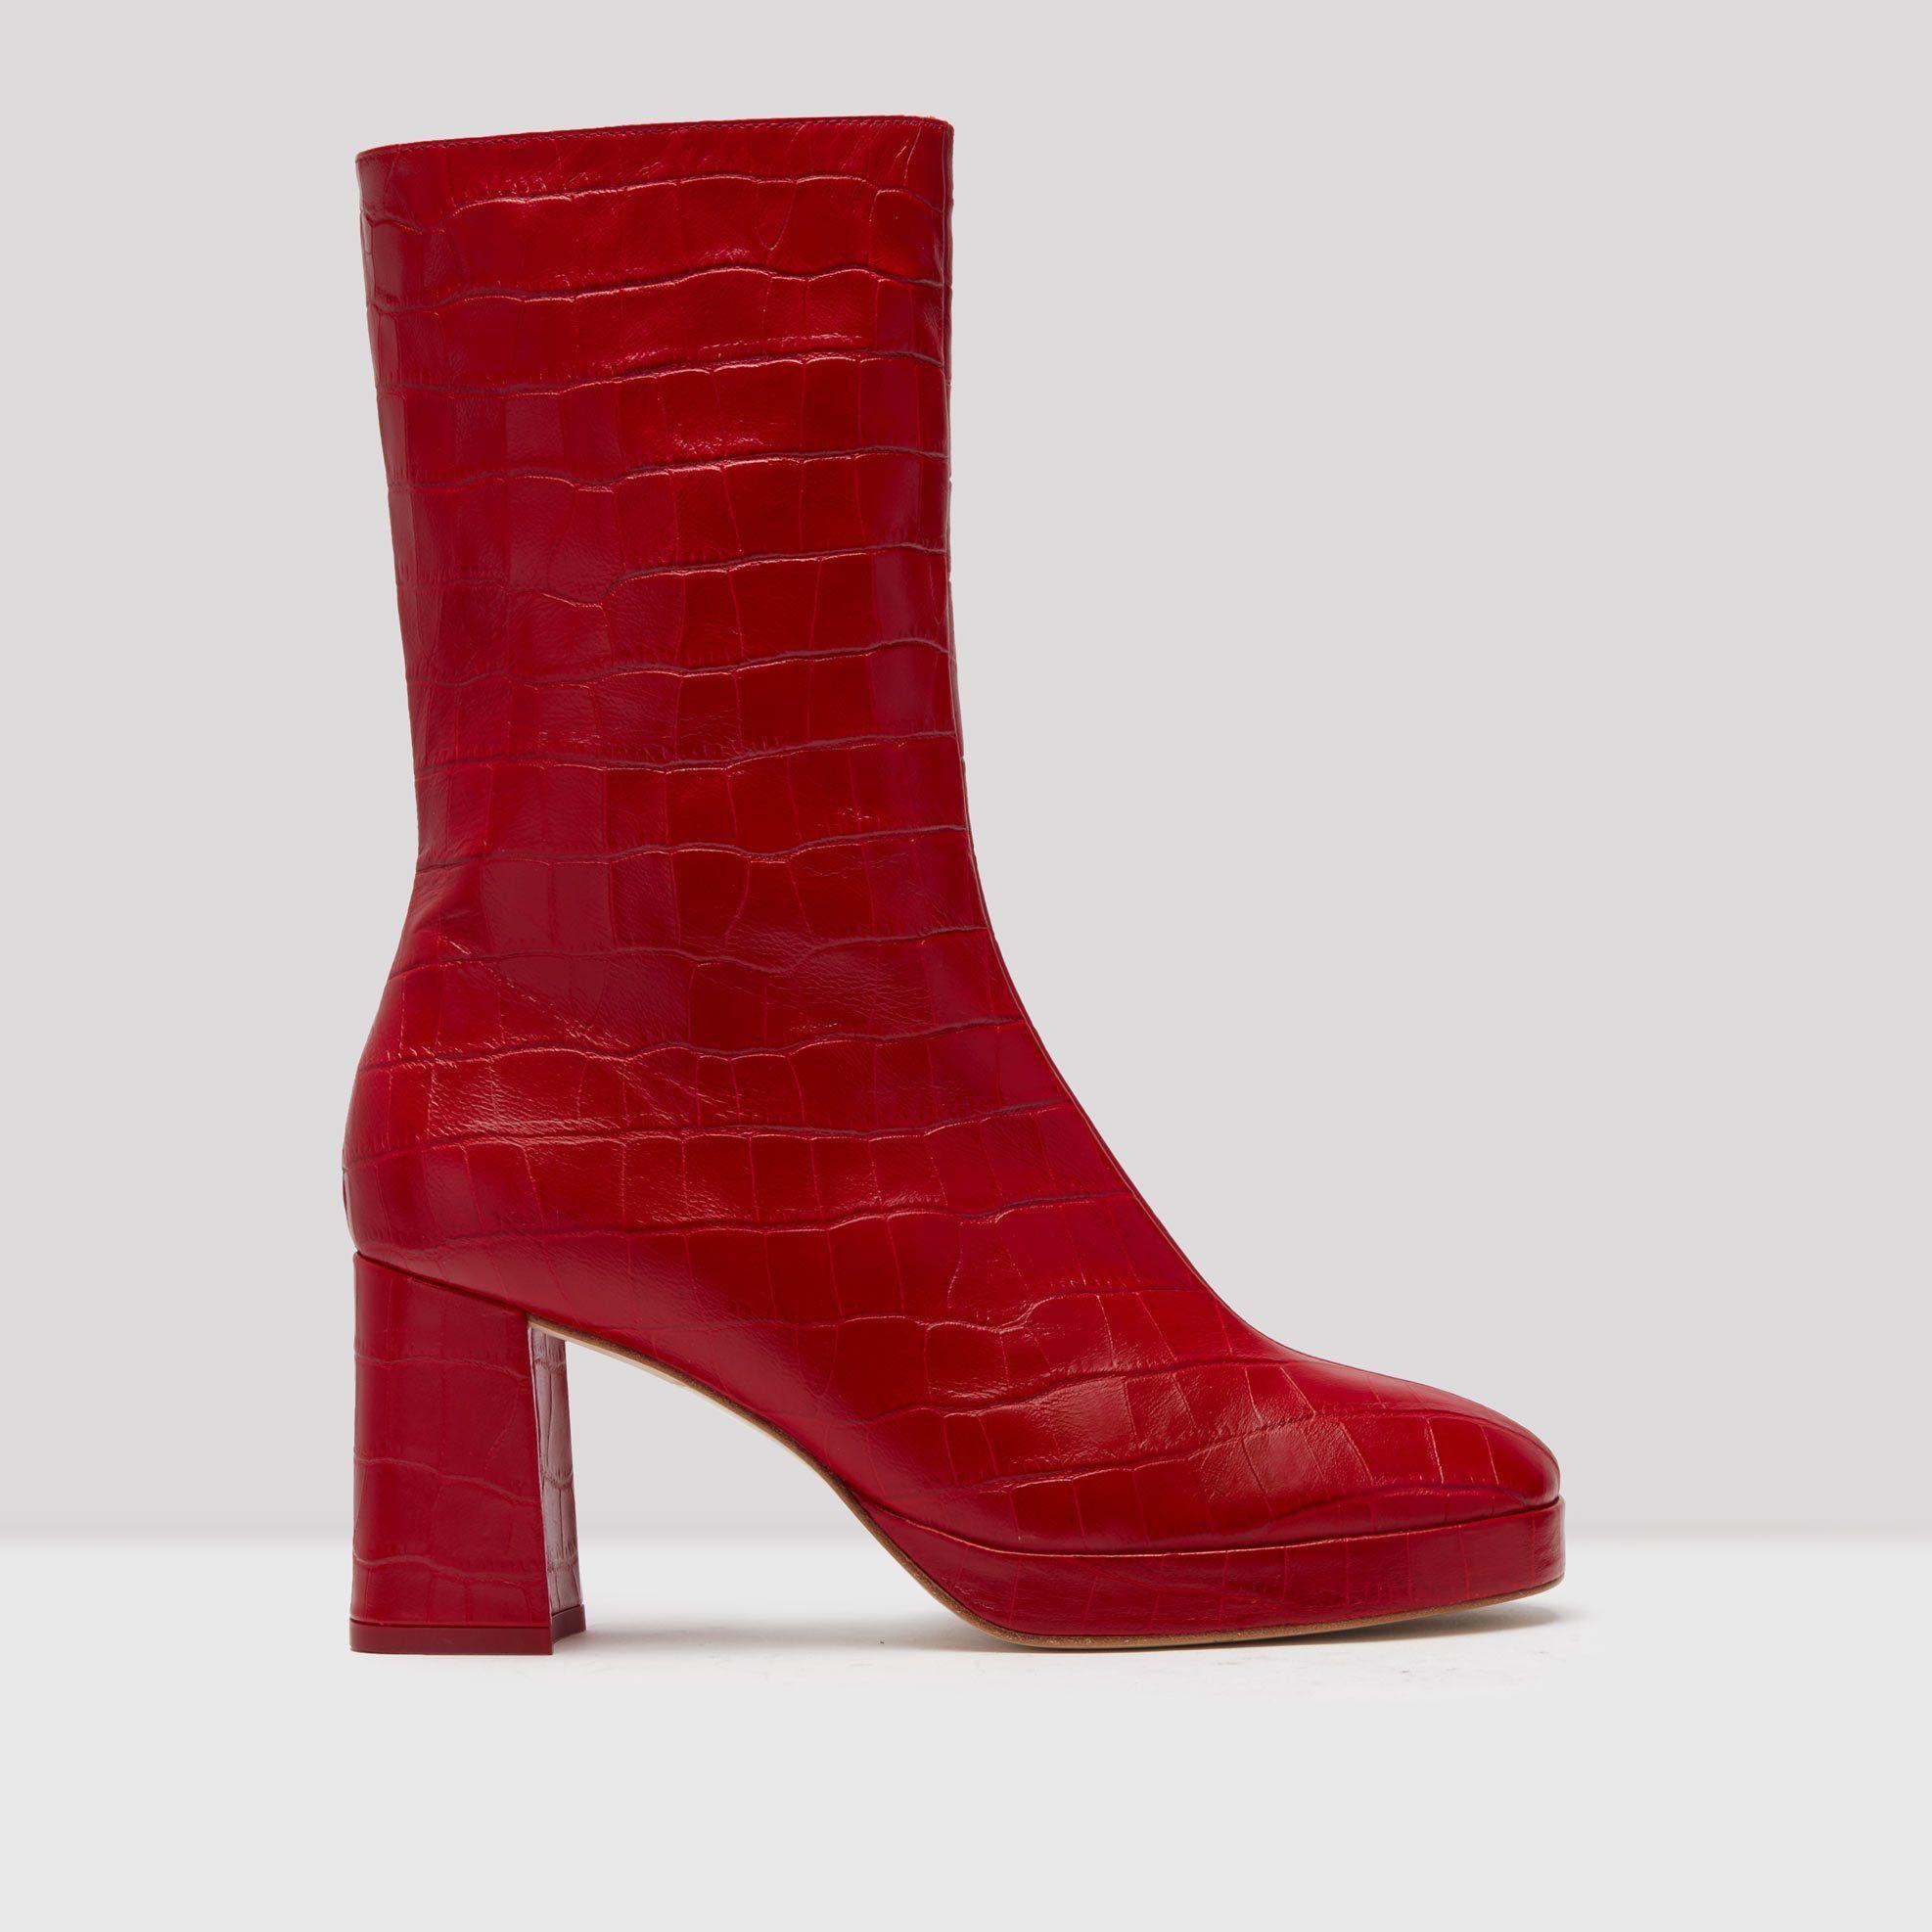 08644e15b568 Miista-Carlota Red Croc Leather Boots-   Botas   Pinterest